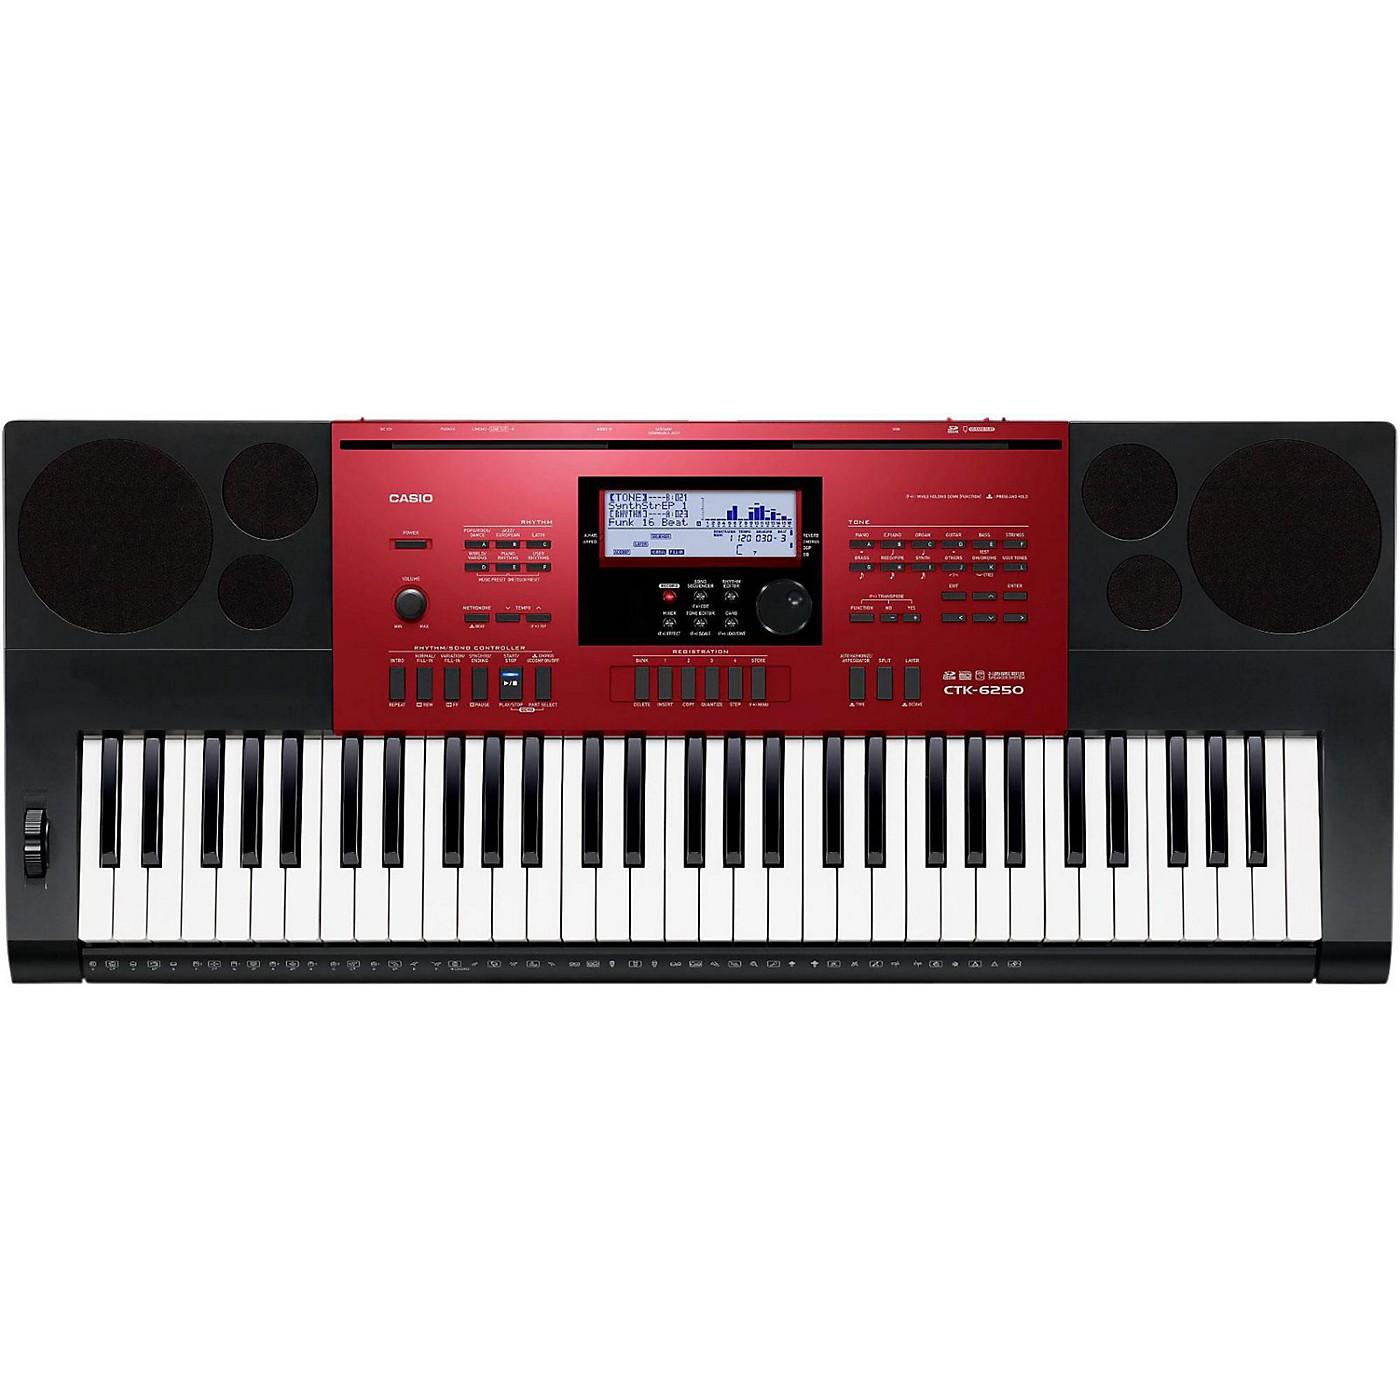 Casio CTK-6250 61 Keys Portable Keyboard thumbnail